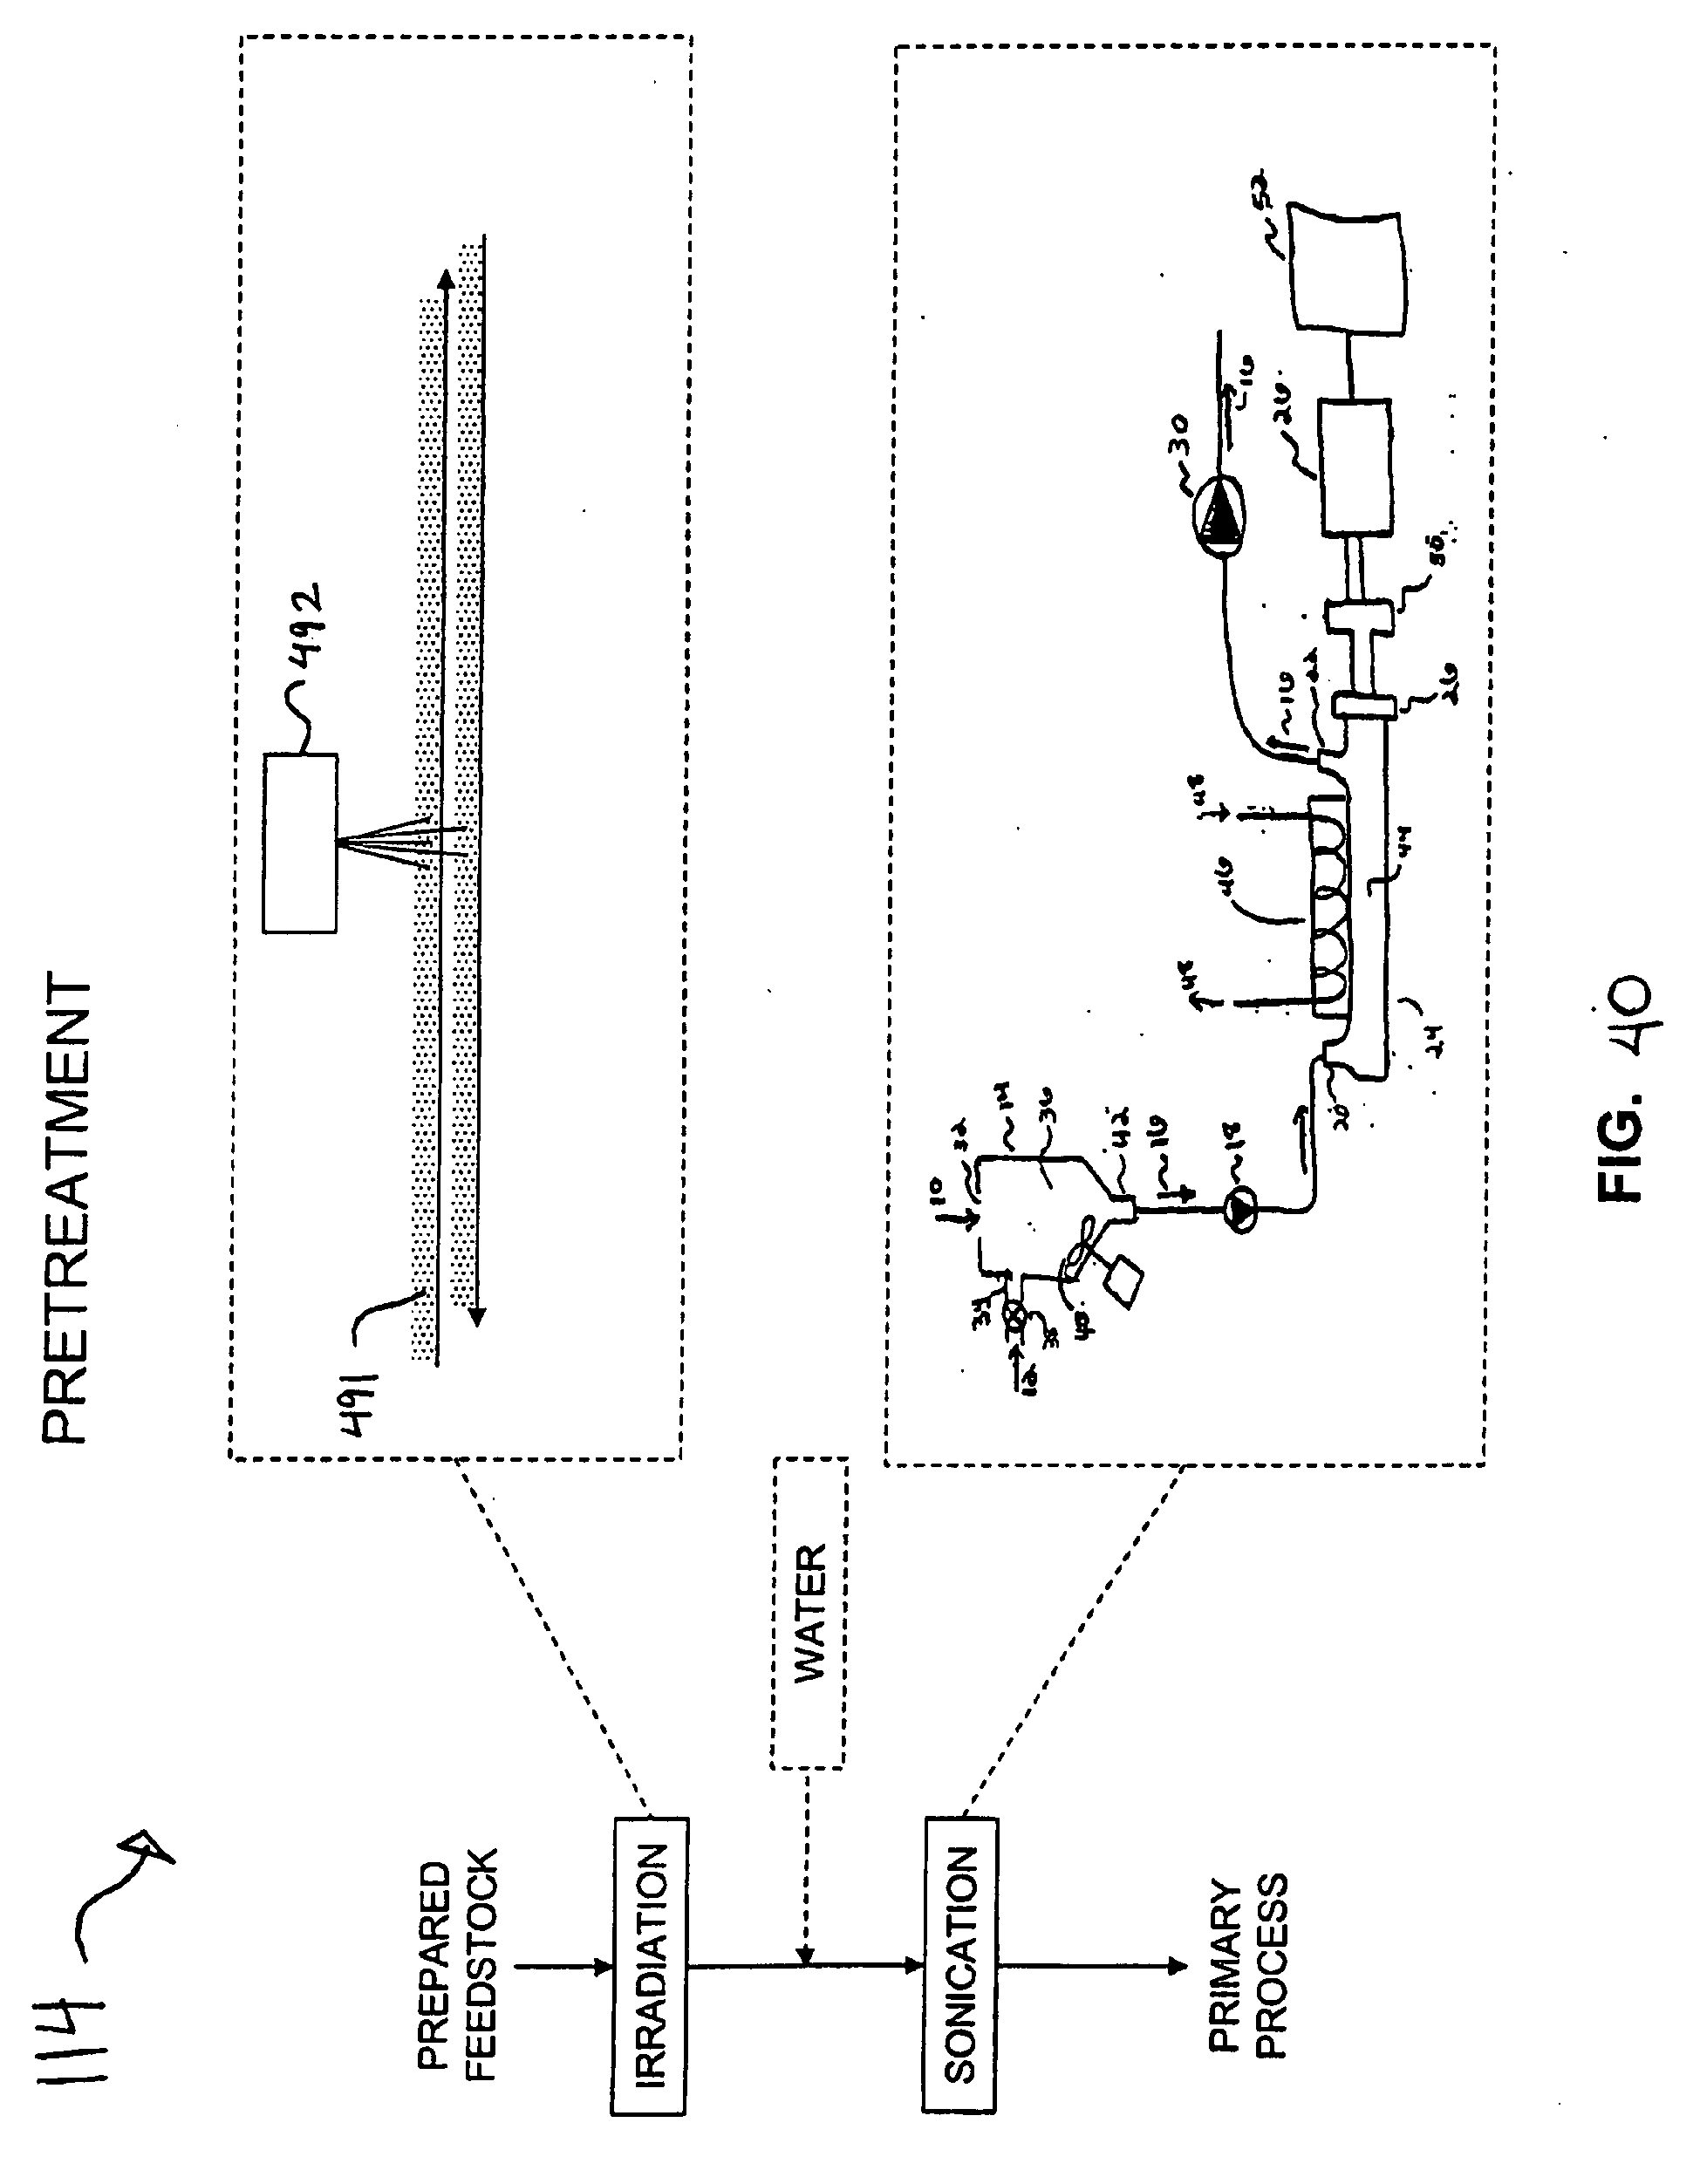 EP2098558A1 - Processing biomass - Google Patents